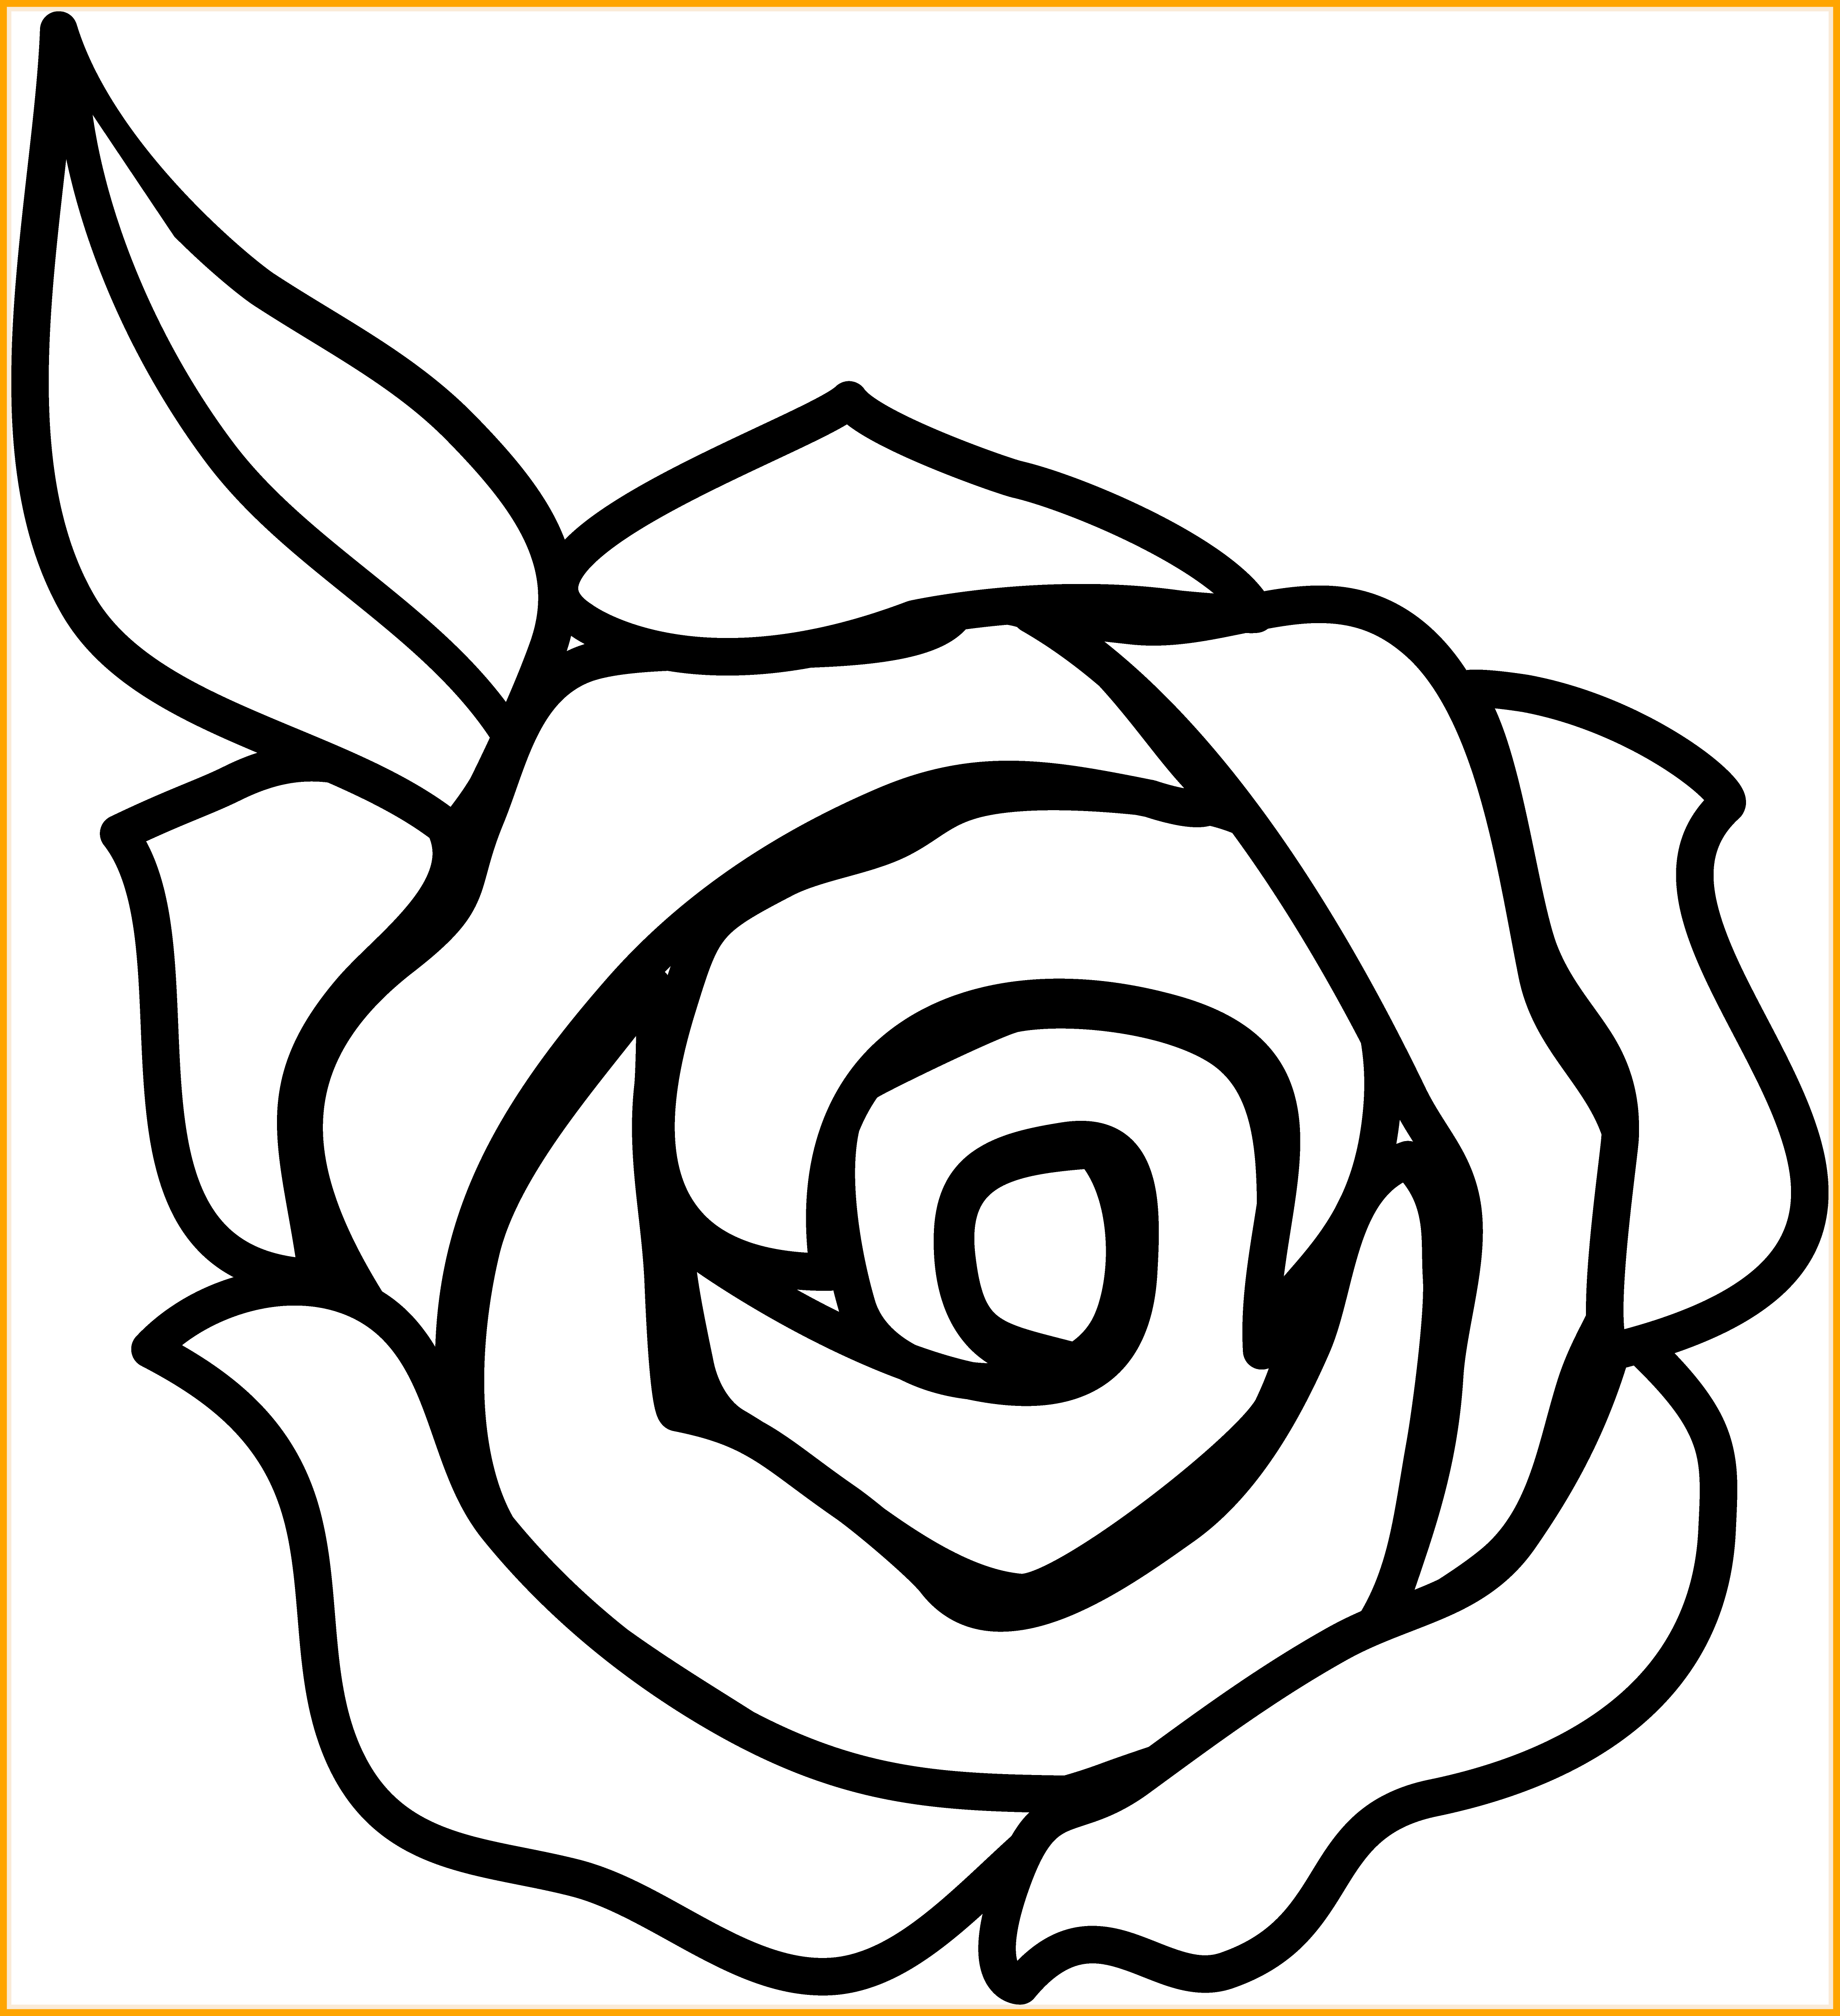 Clipart black and white flower banner Appealing Black And White Rose Border Clip Art Clipart Panda Pics ... banner